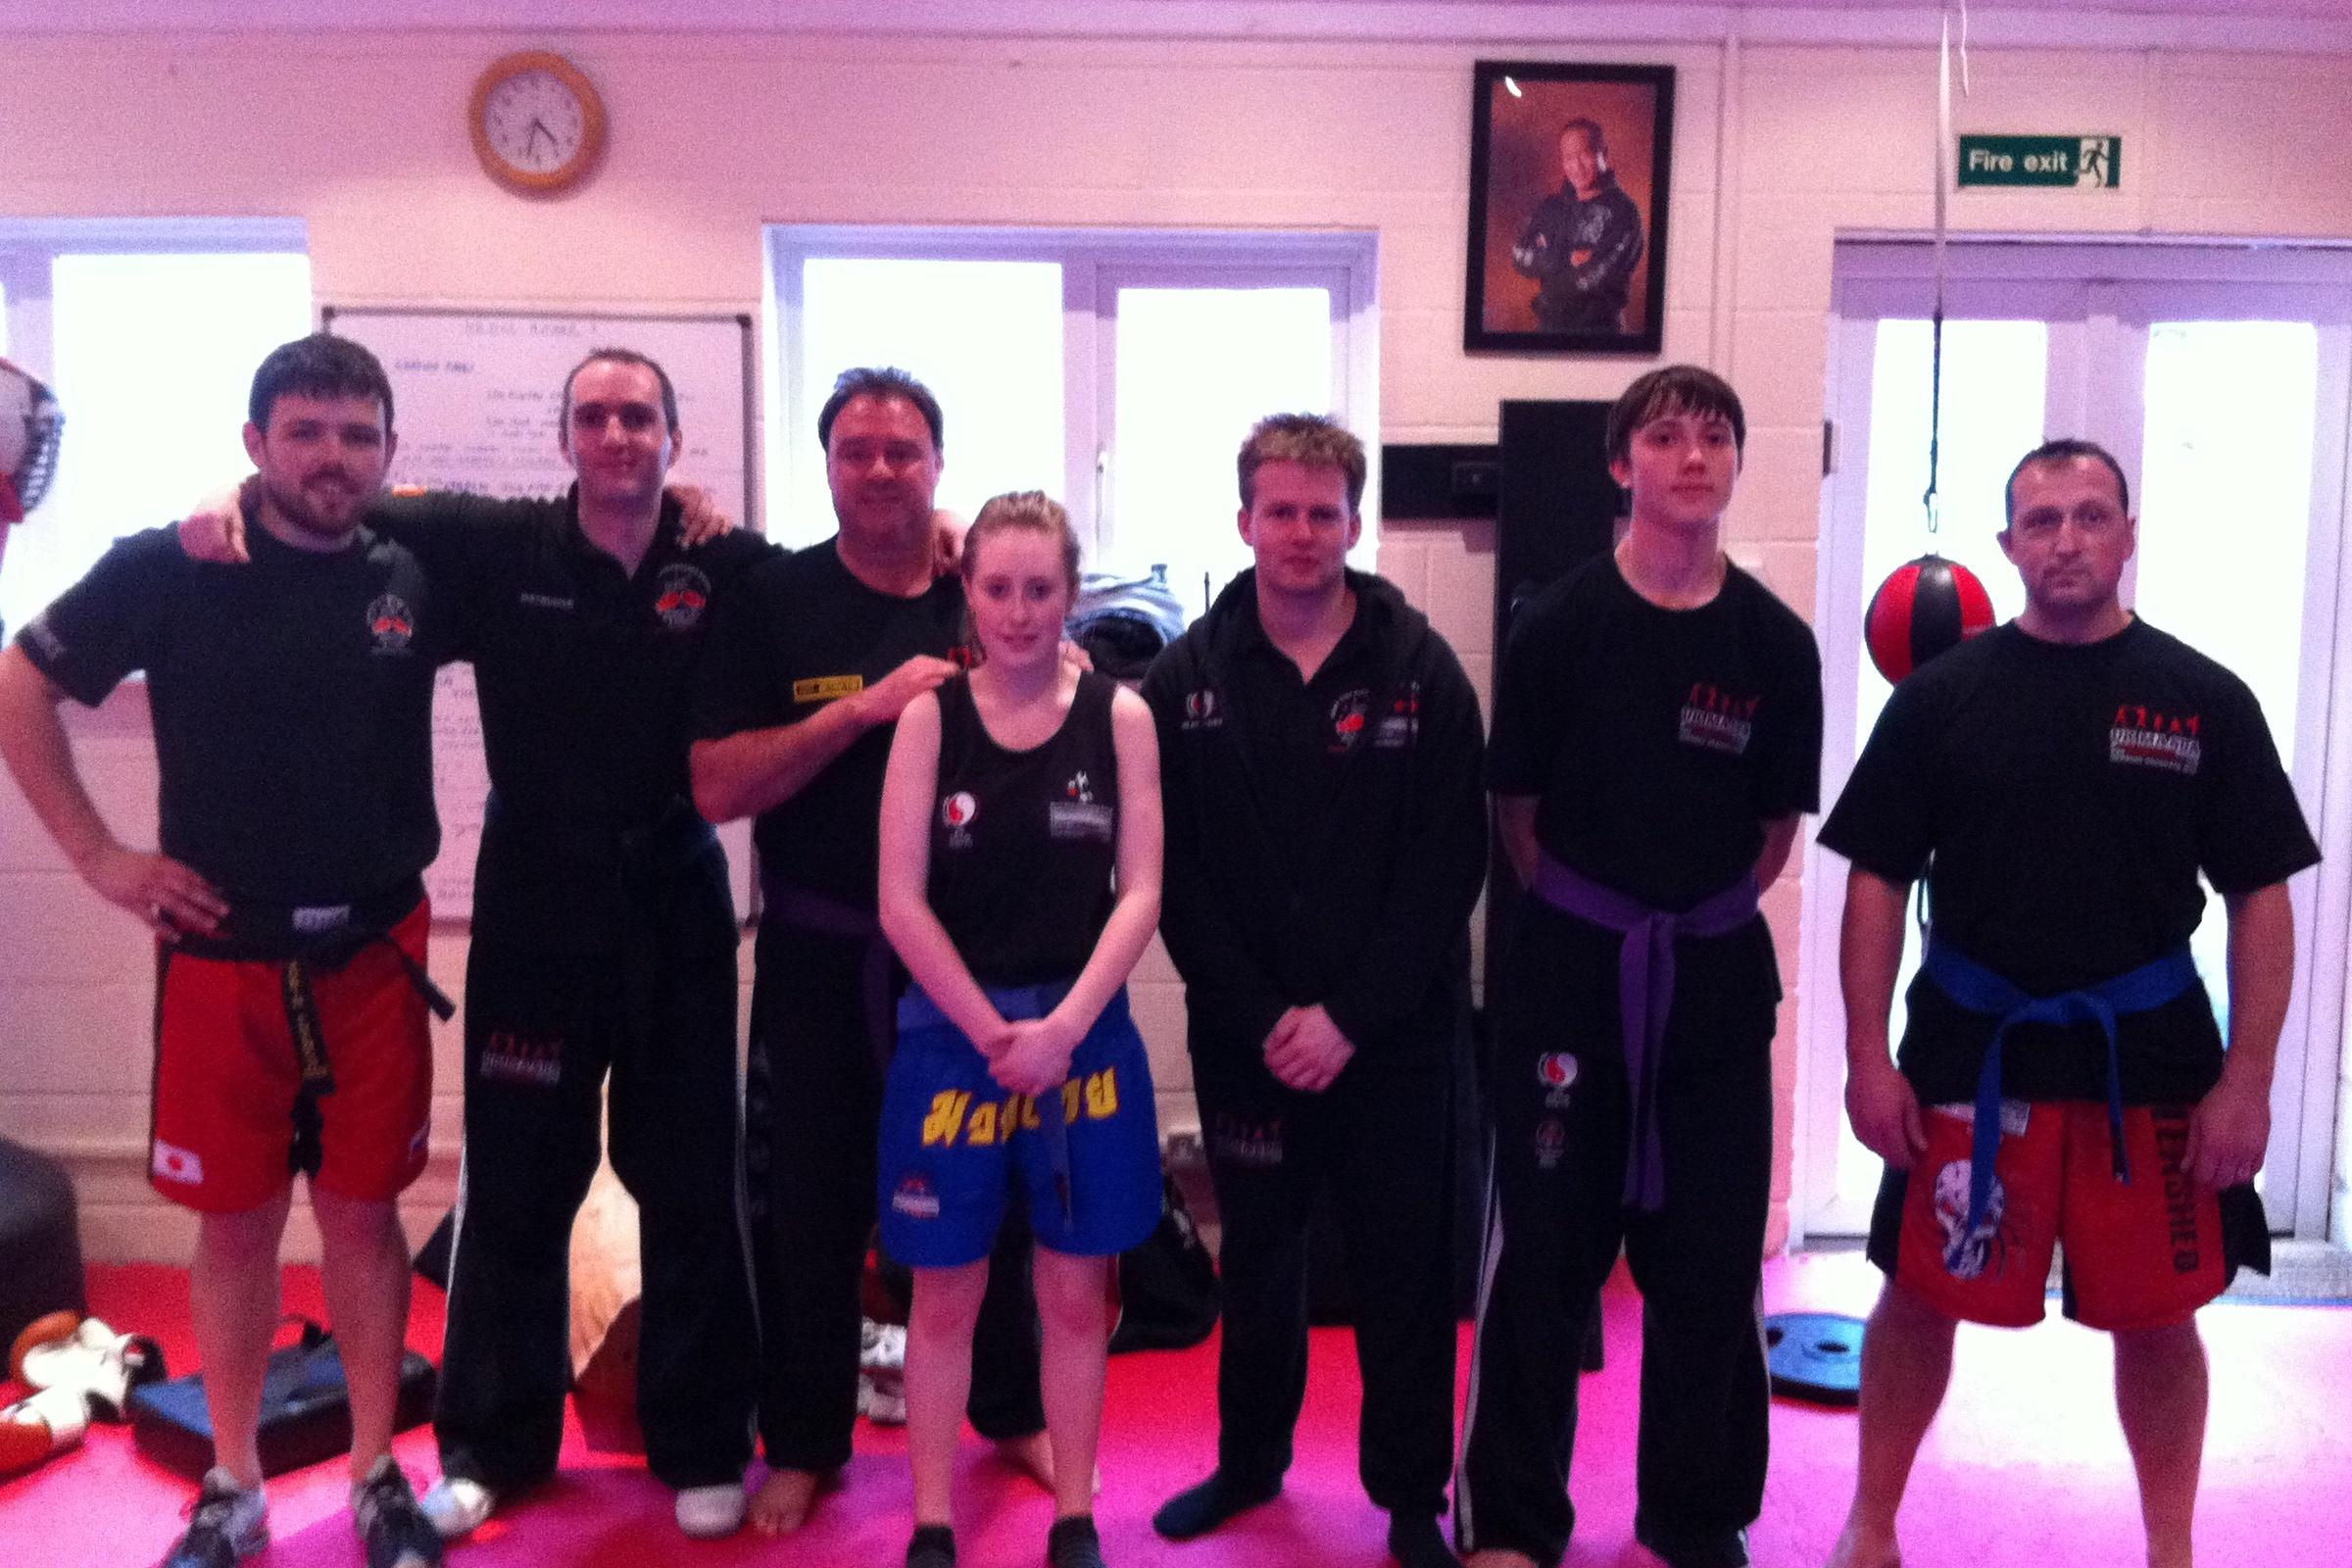 Jun Fan Gung Fu Kali Seminar March 2011 | Laurence Sandum's Black Belt Martial Arts Academy